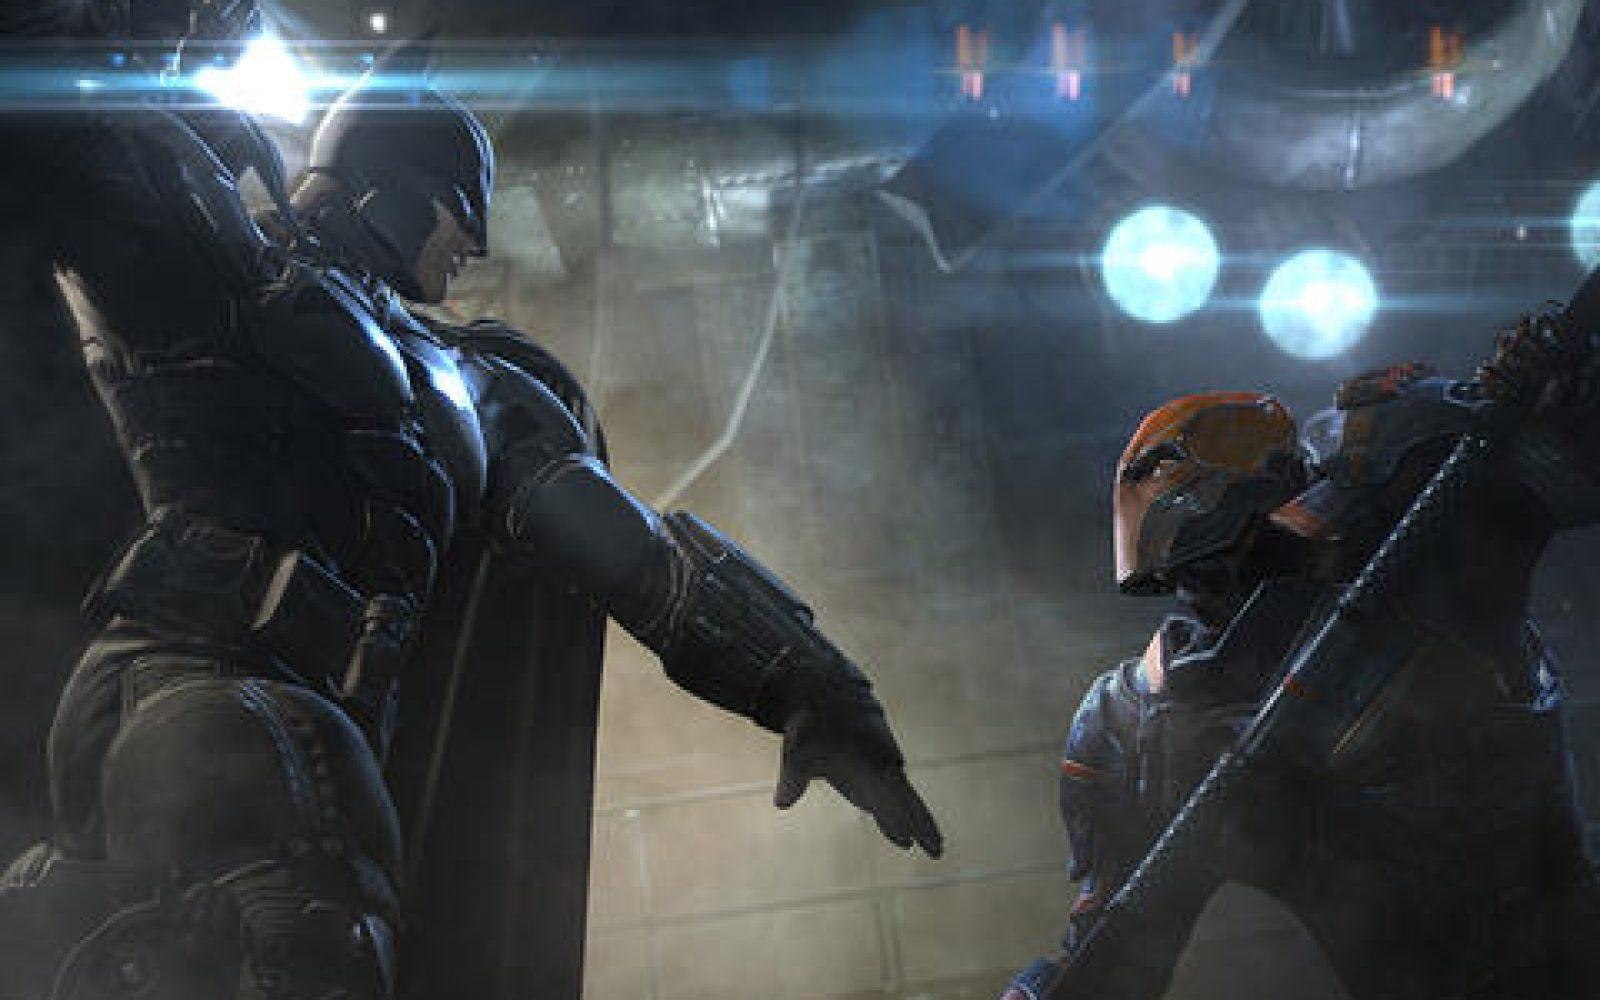 Batman Arkham Origins 9to5toys Return To Asylum Reg 3 Ps4 Game App Deals For Ios Out Now Asphalt 8 Airborne Free Freebies More